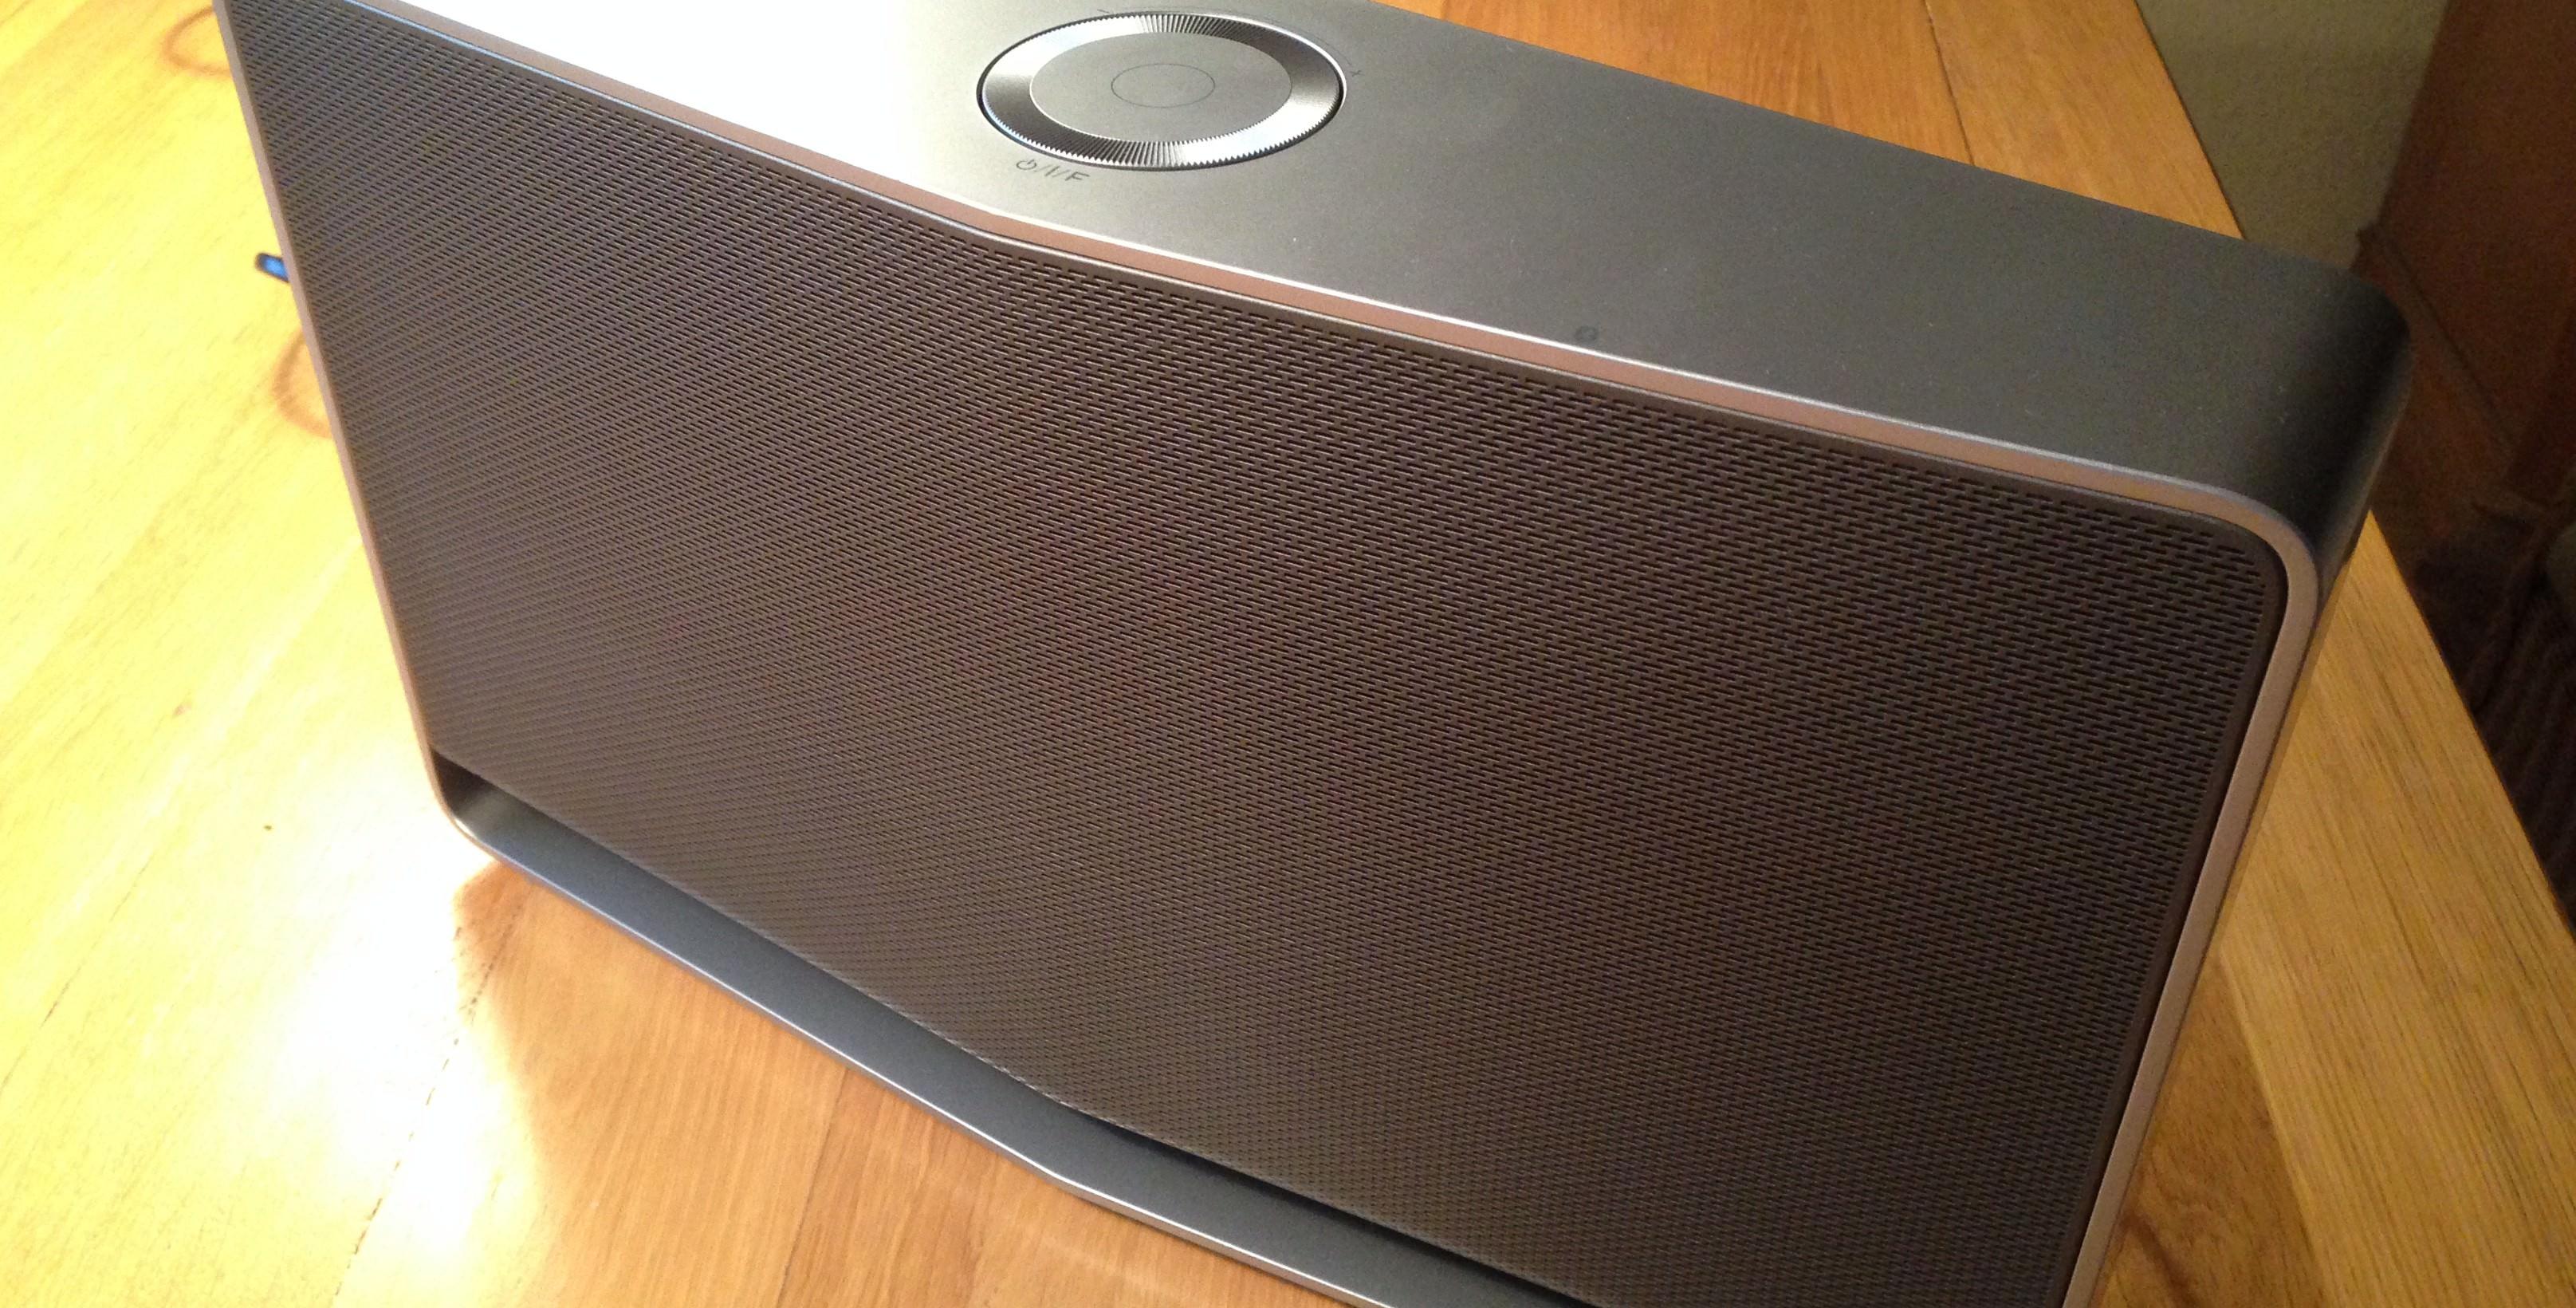 Soundsystem LG NP 8540 im Test: Souveränes